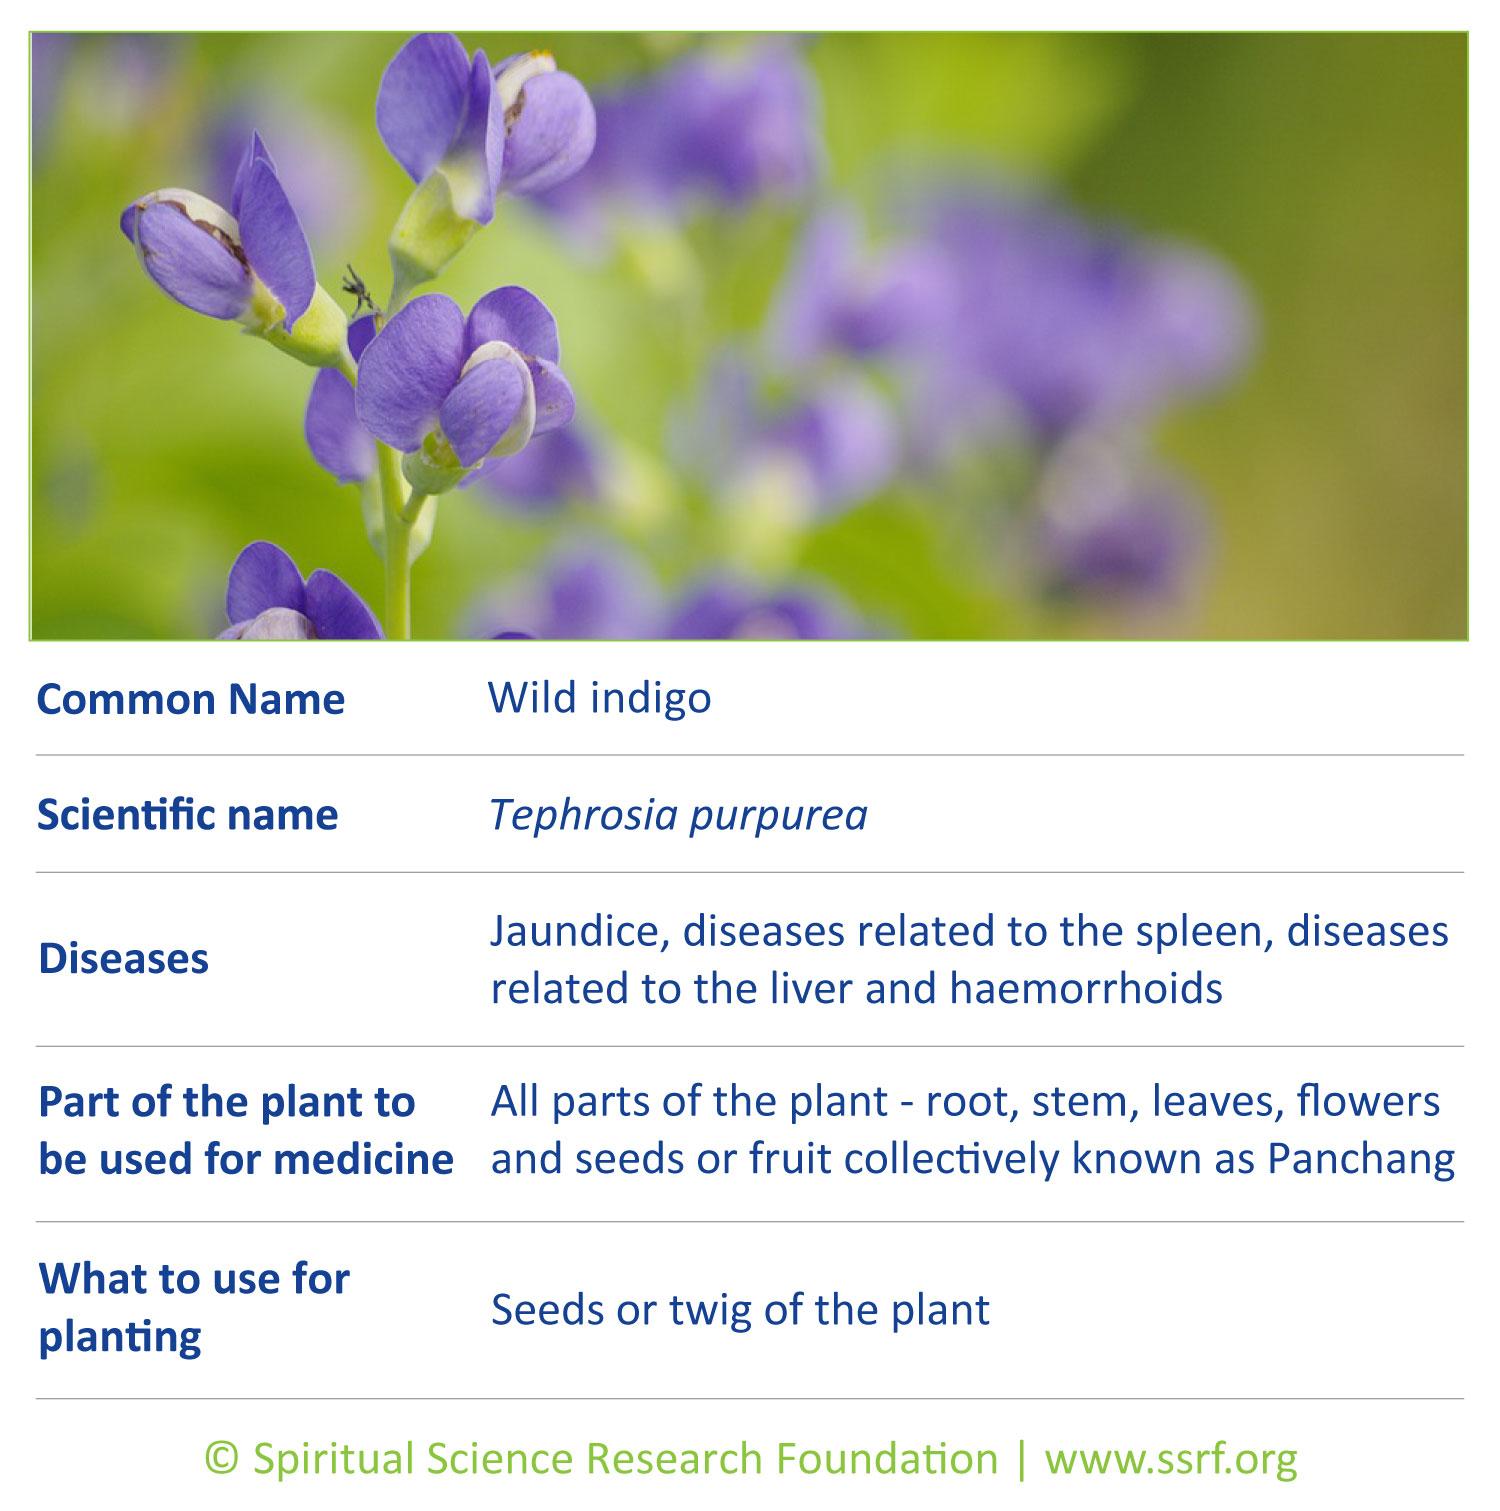 Small-plants-4-Wild-indigo